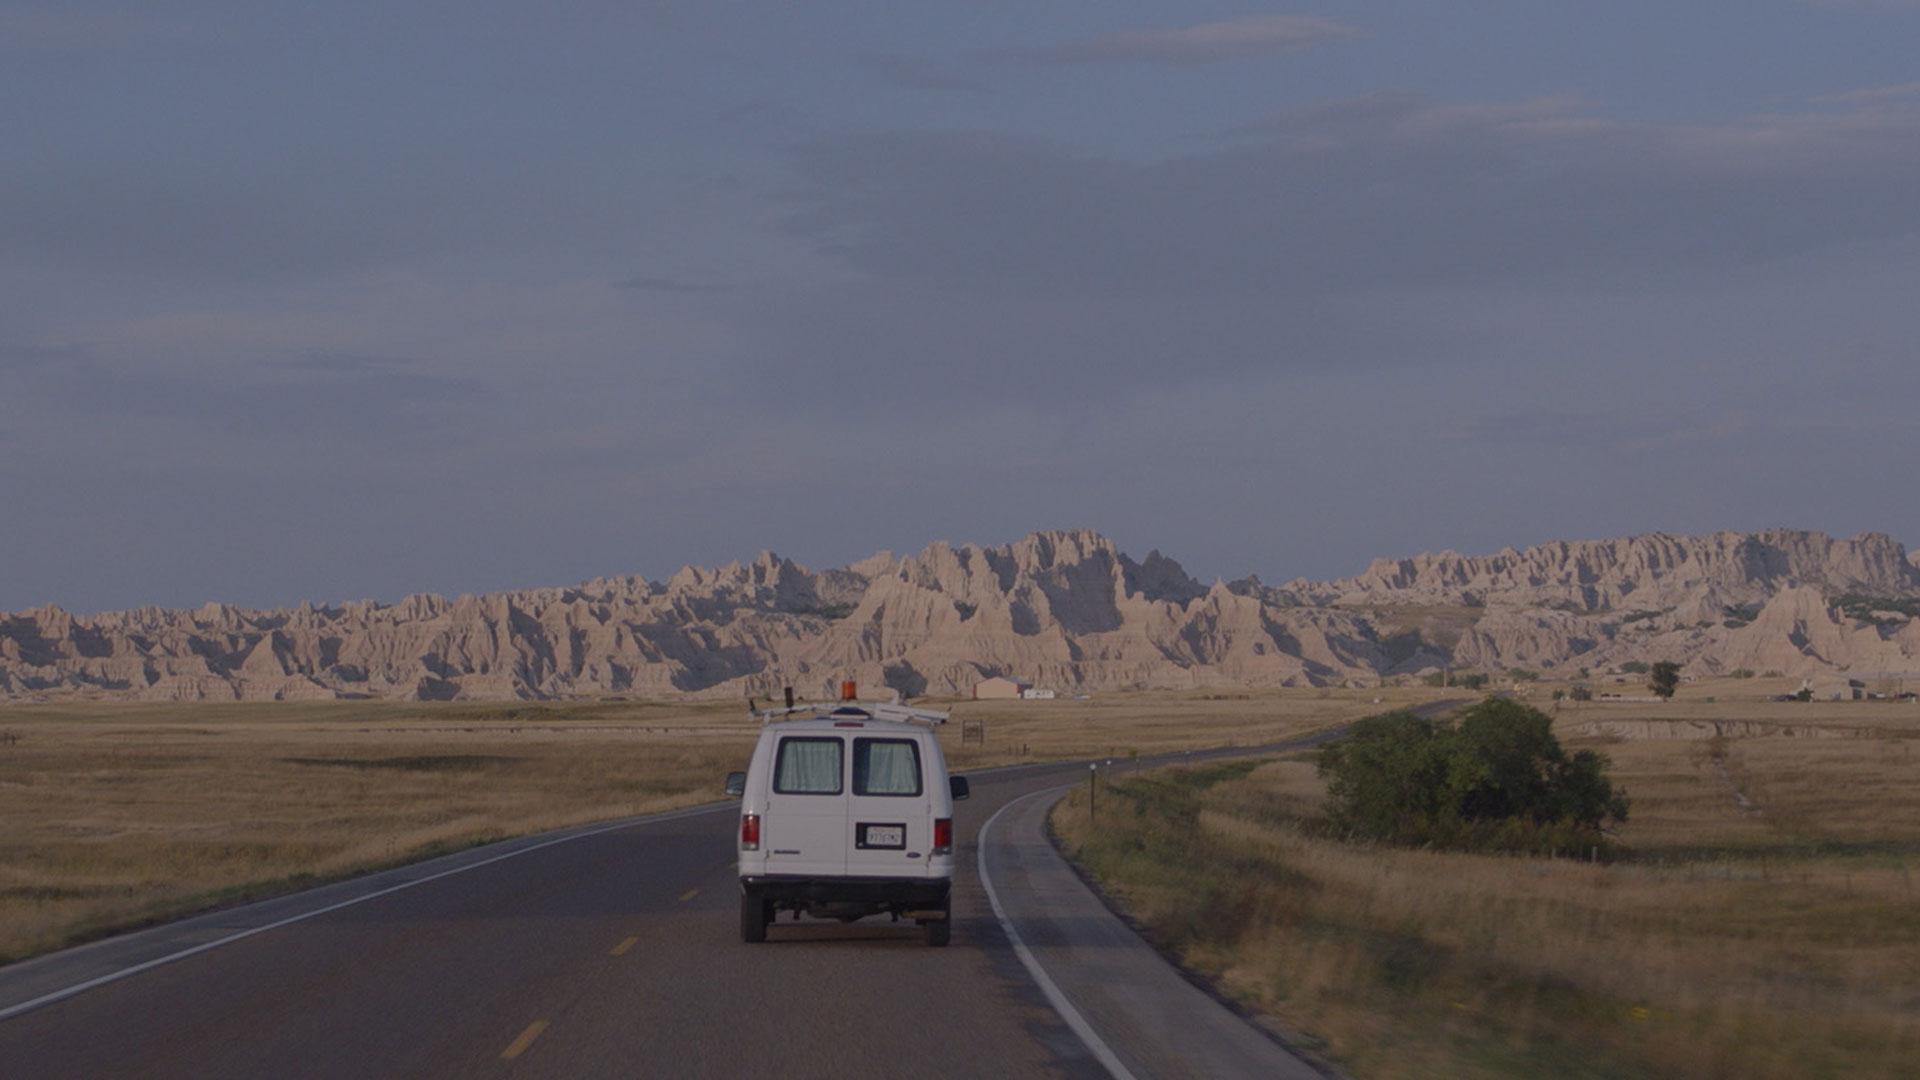 فیلم Nomadland